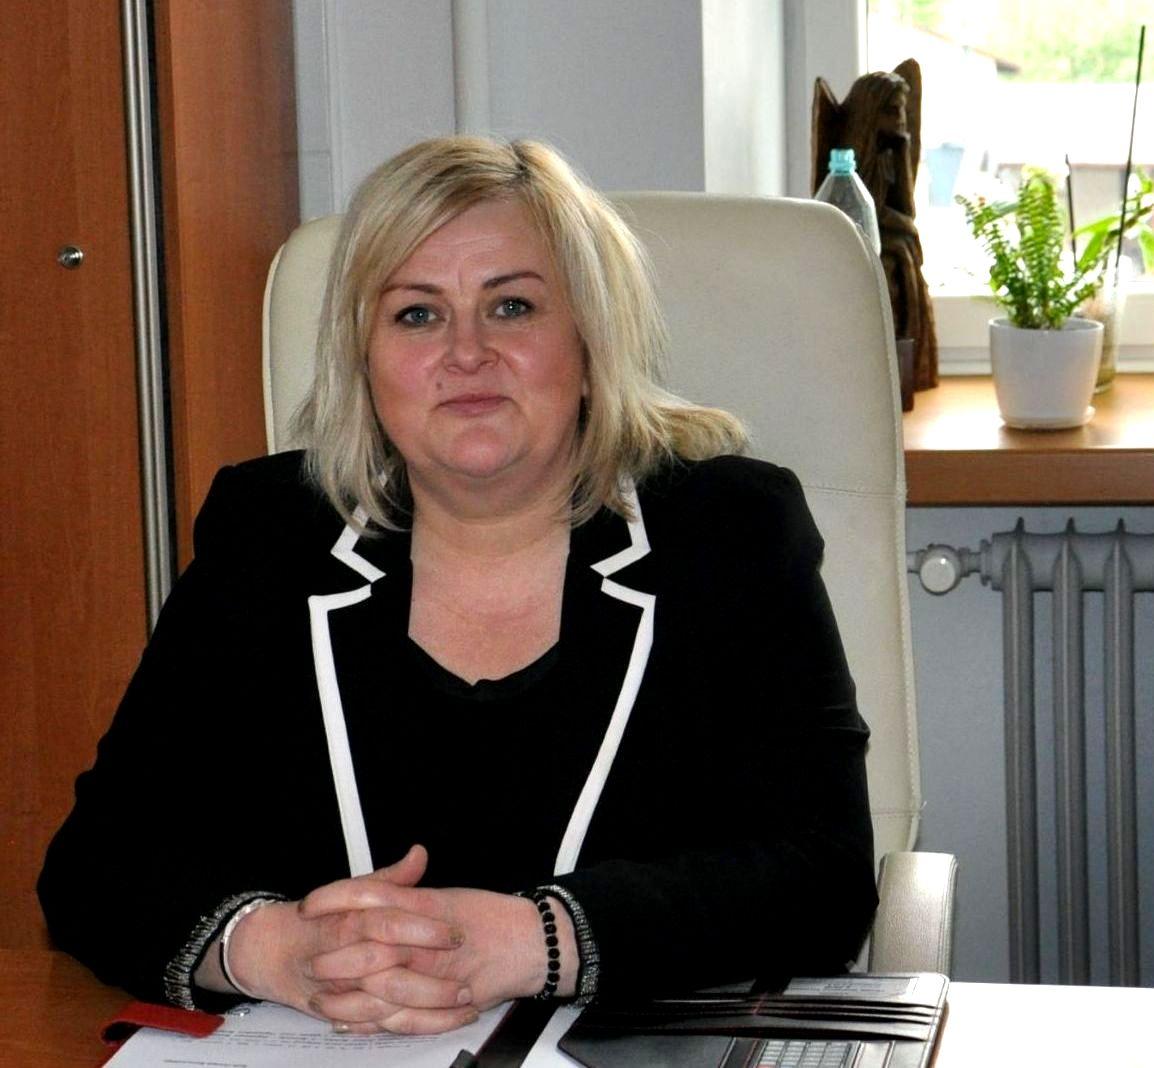 A.Gabrowska, dyrektor PCPR w Rzeszowie